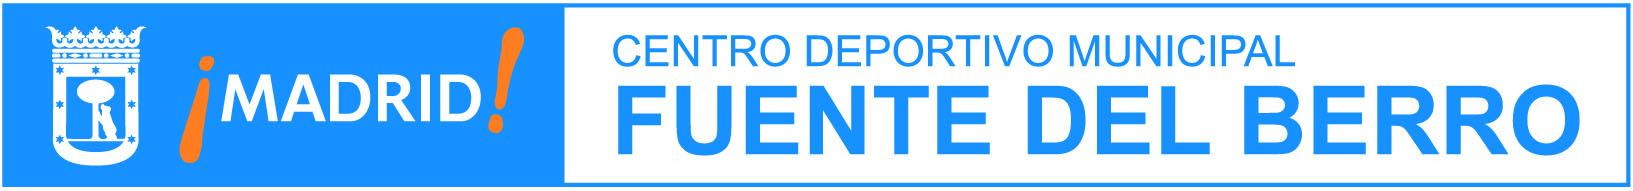 Logo CDM FUENTE DEL BERRO